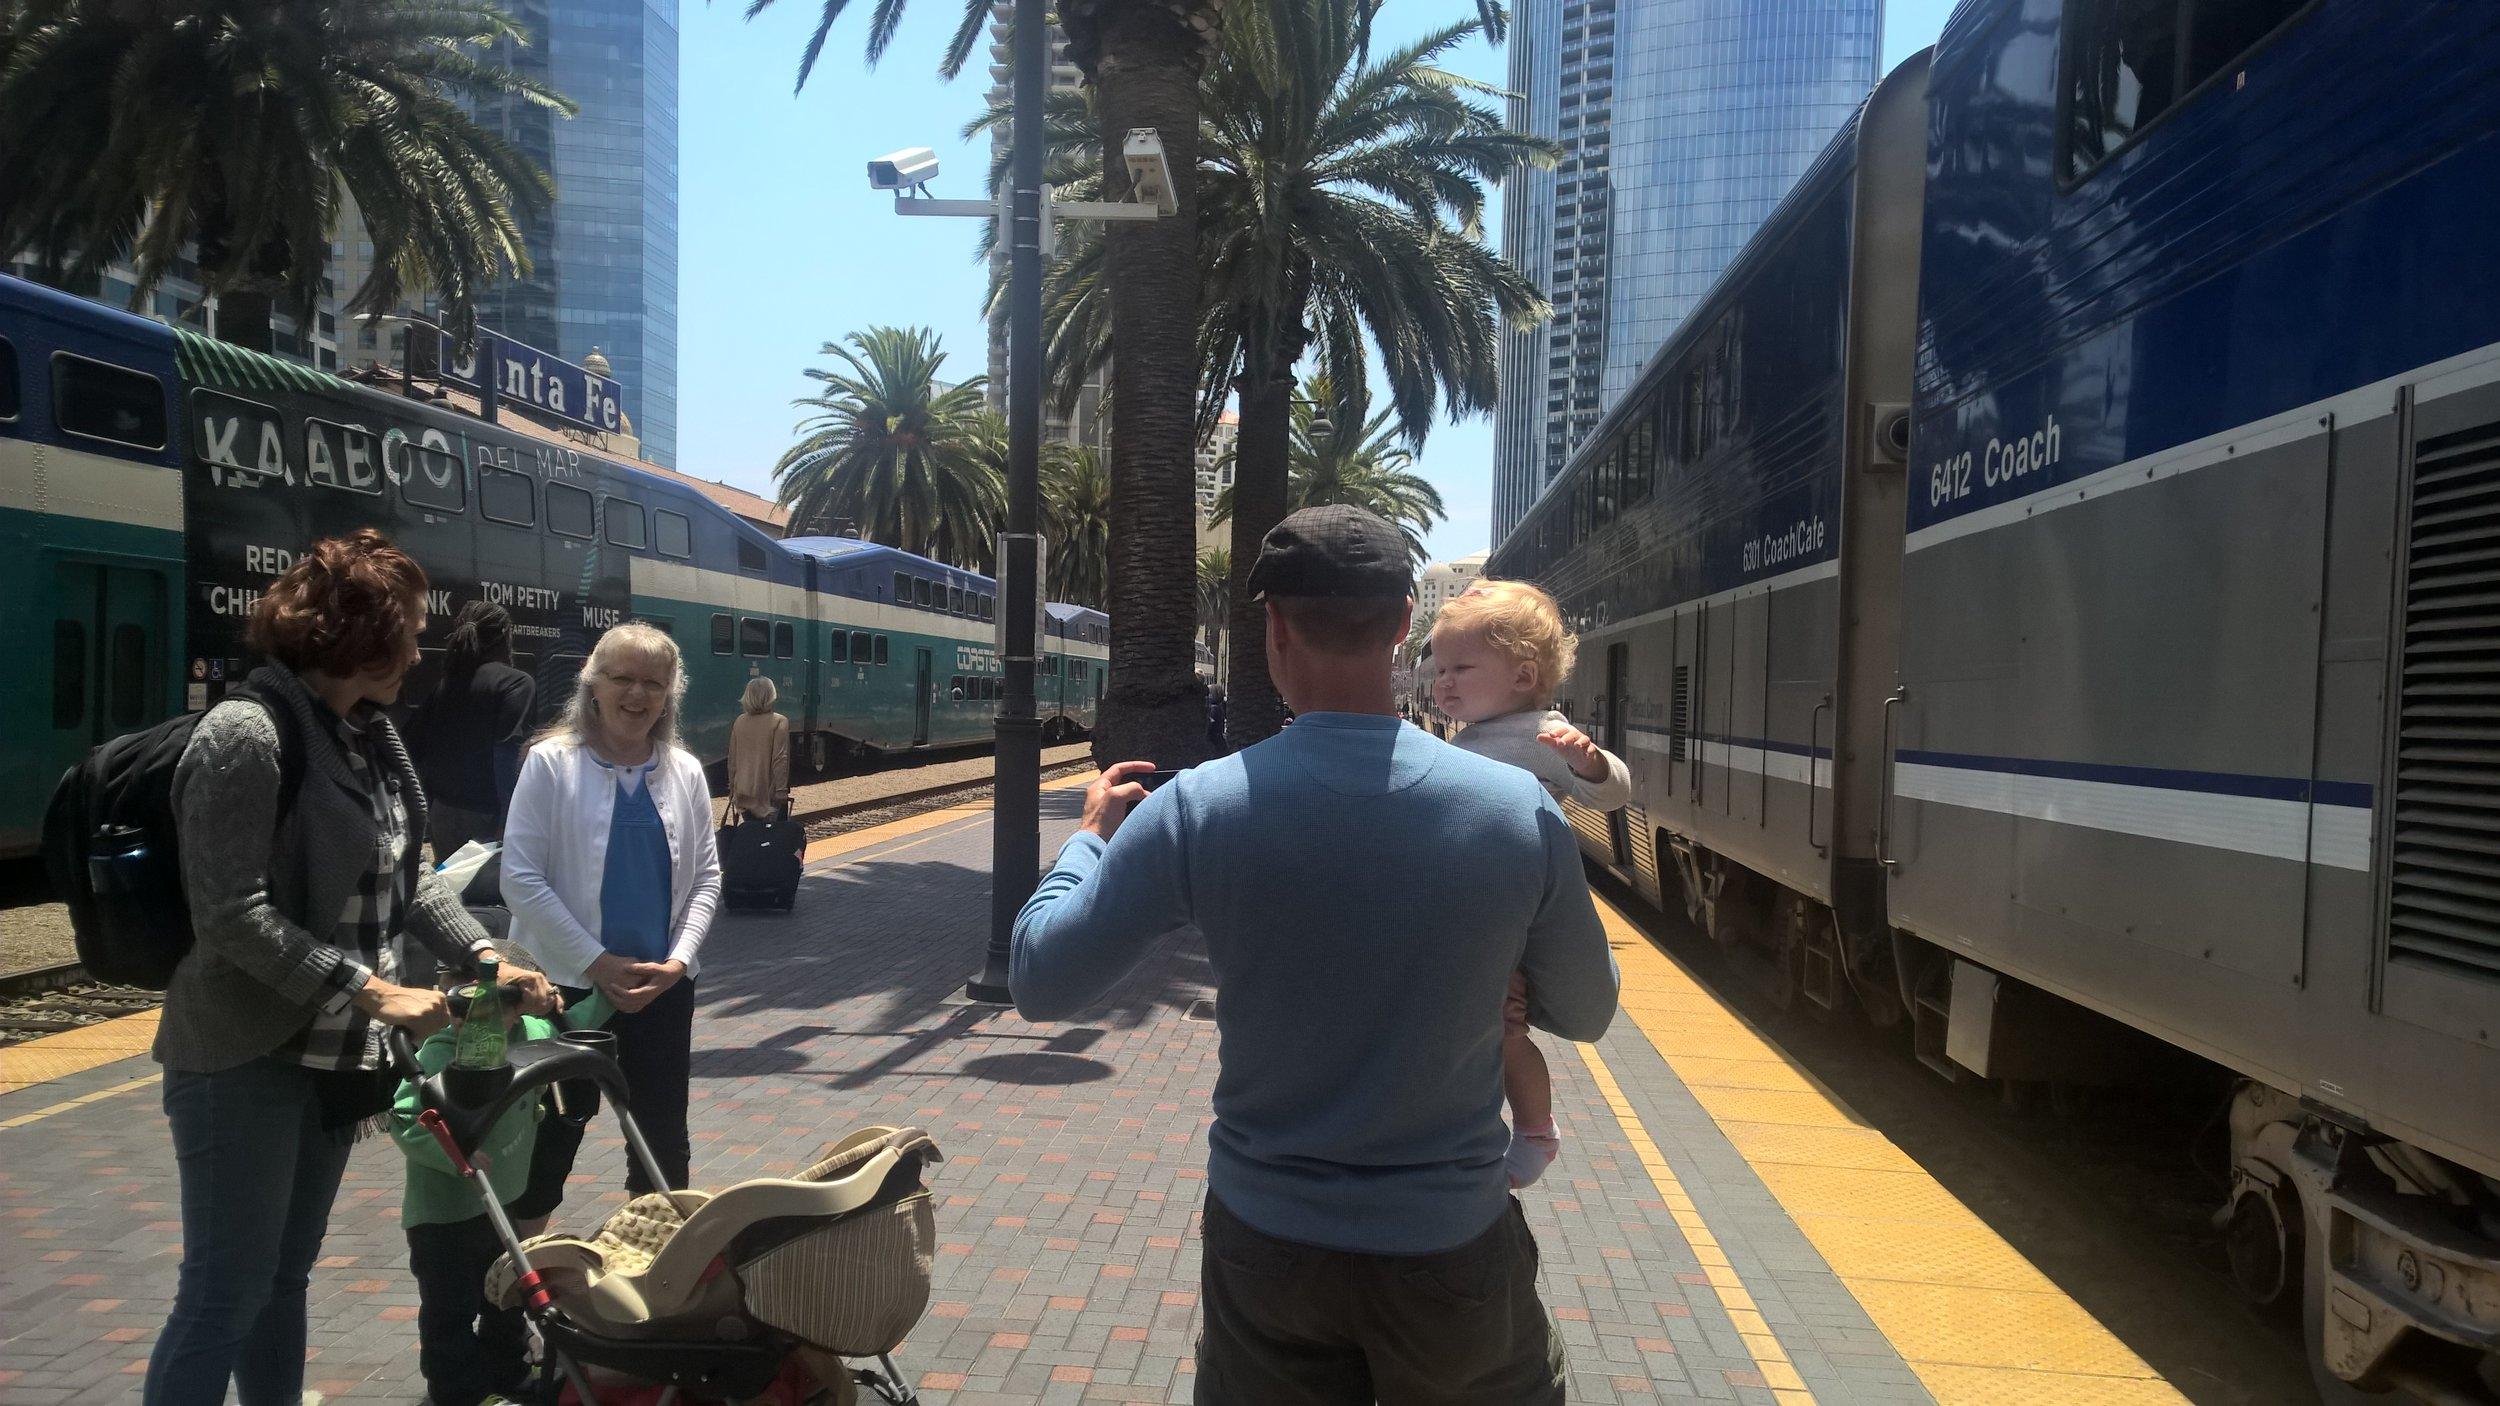 Arriving at San Deigo Union Station.